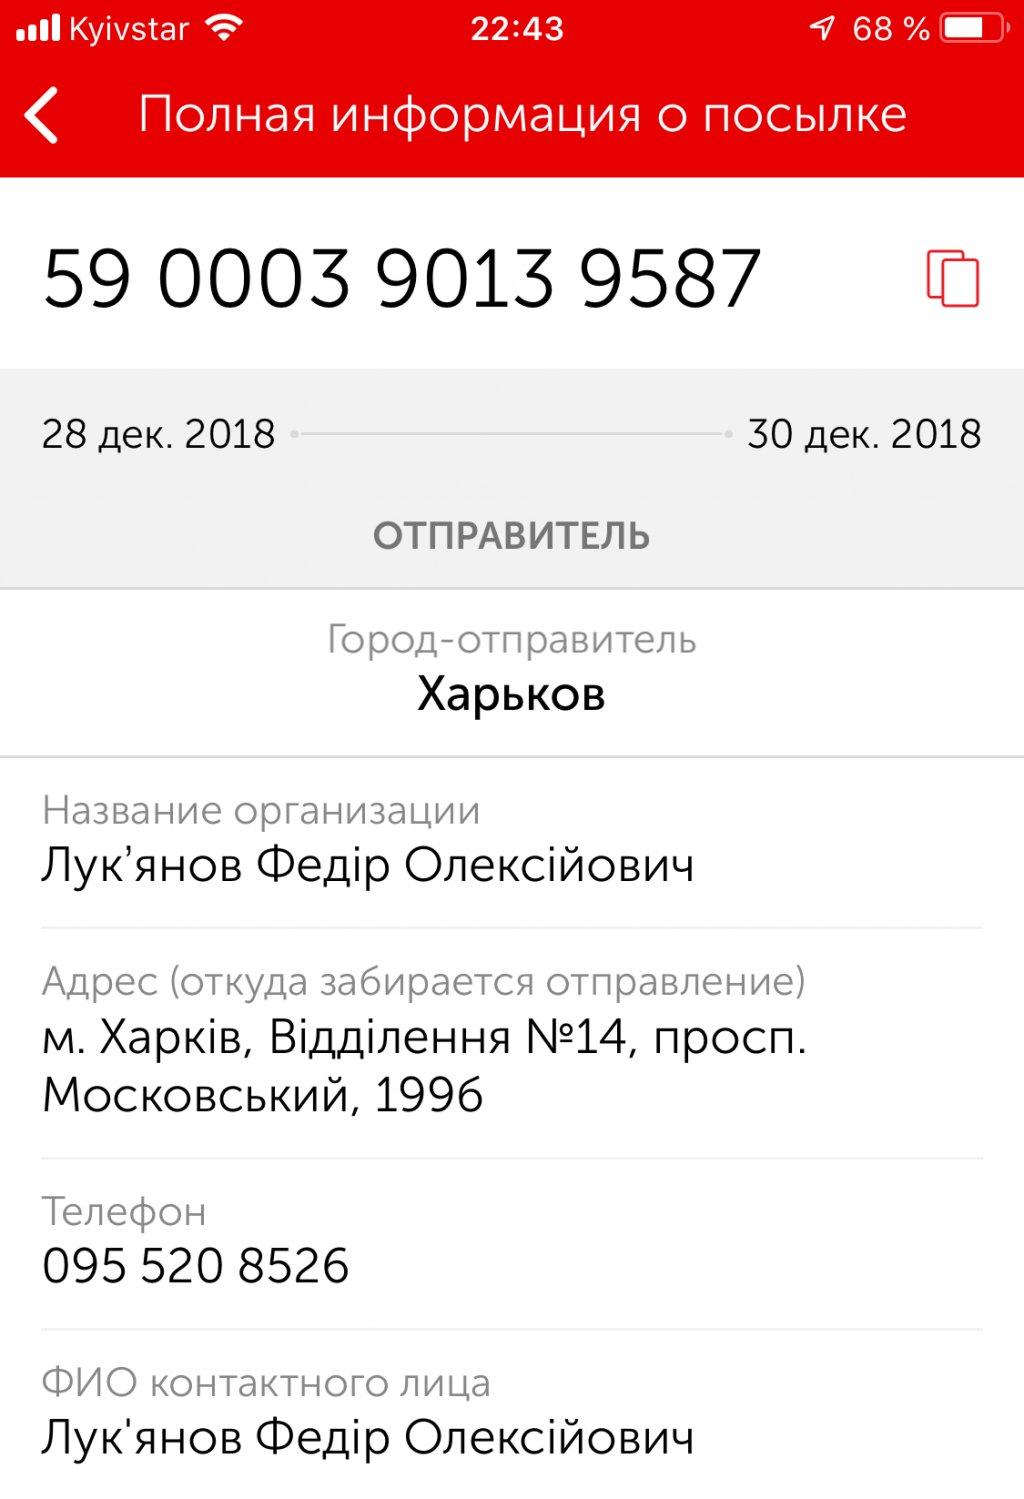 ikra-market.site интернет-магазин - МОШЕННИКИ